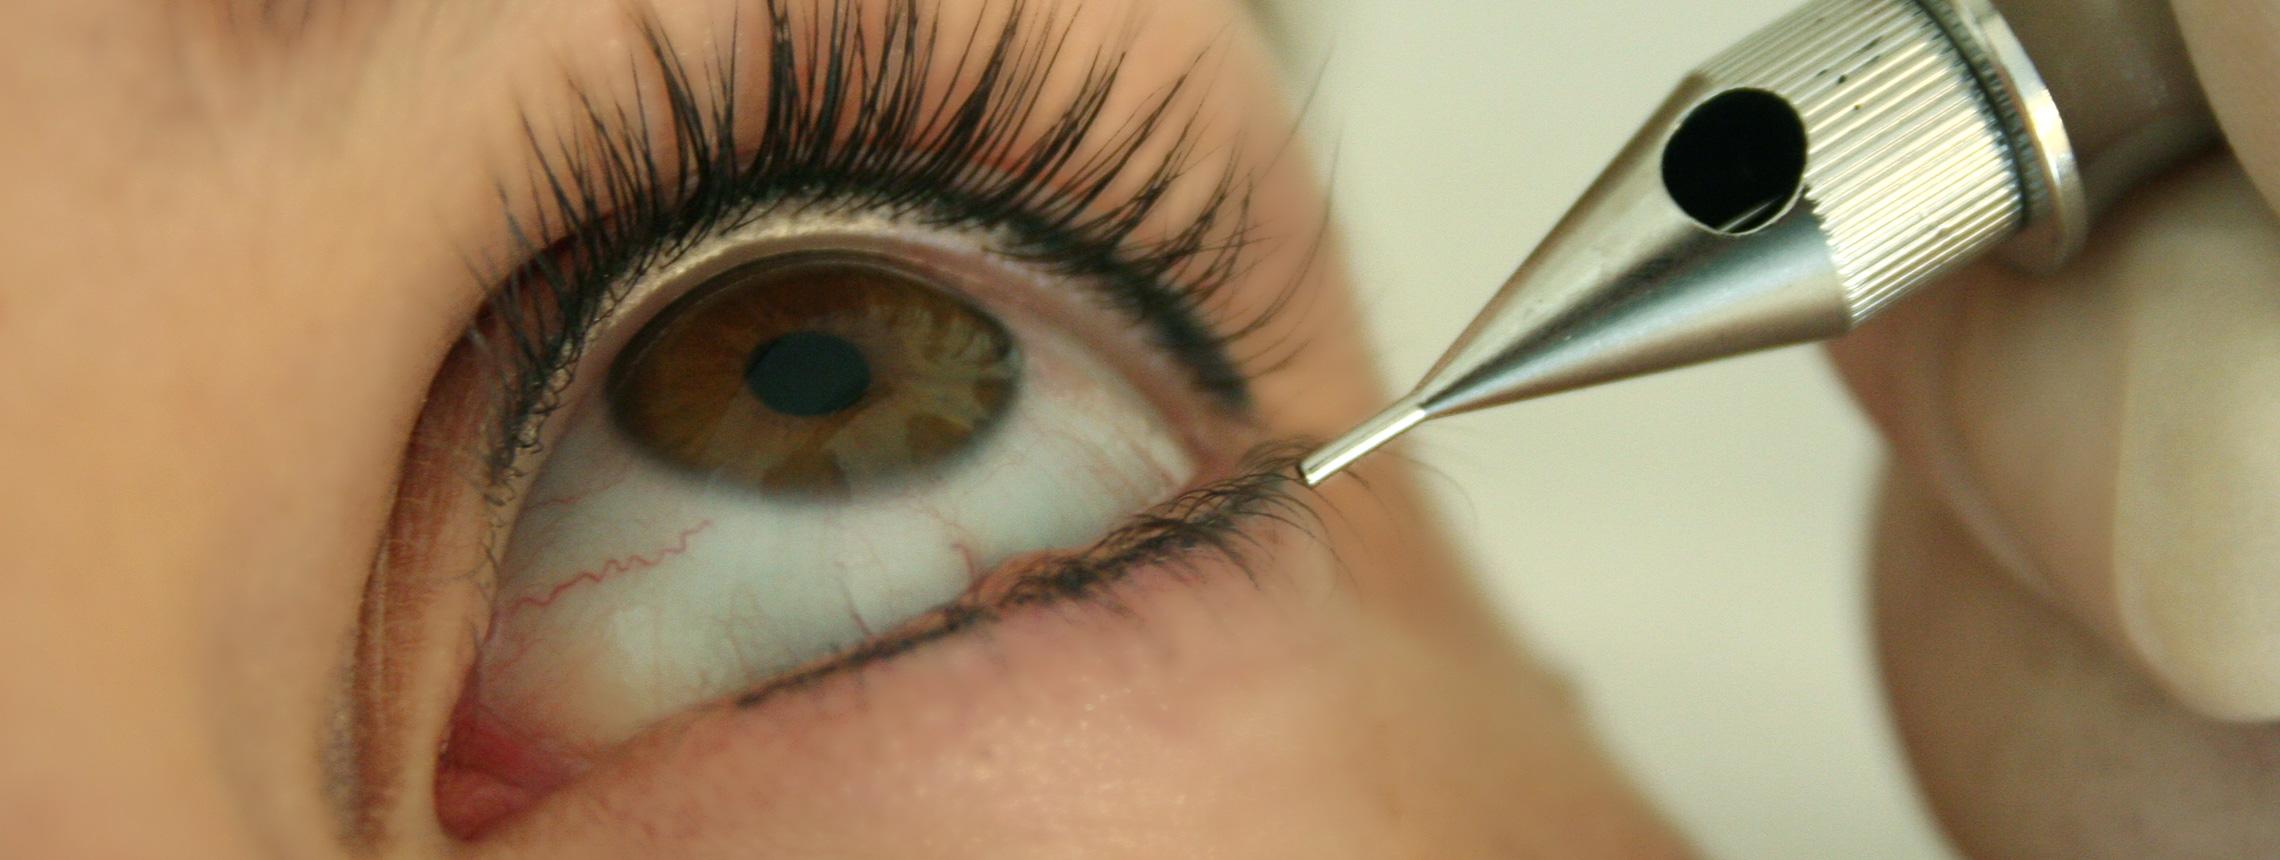 Ausdrucksstarke Augen